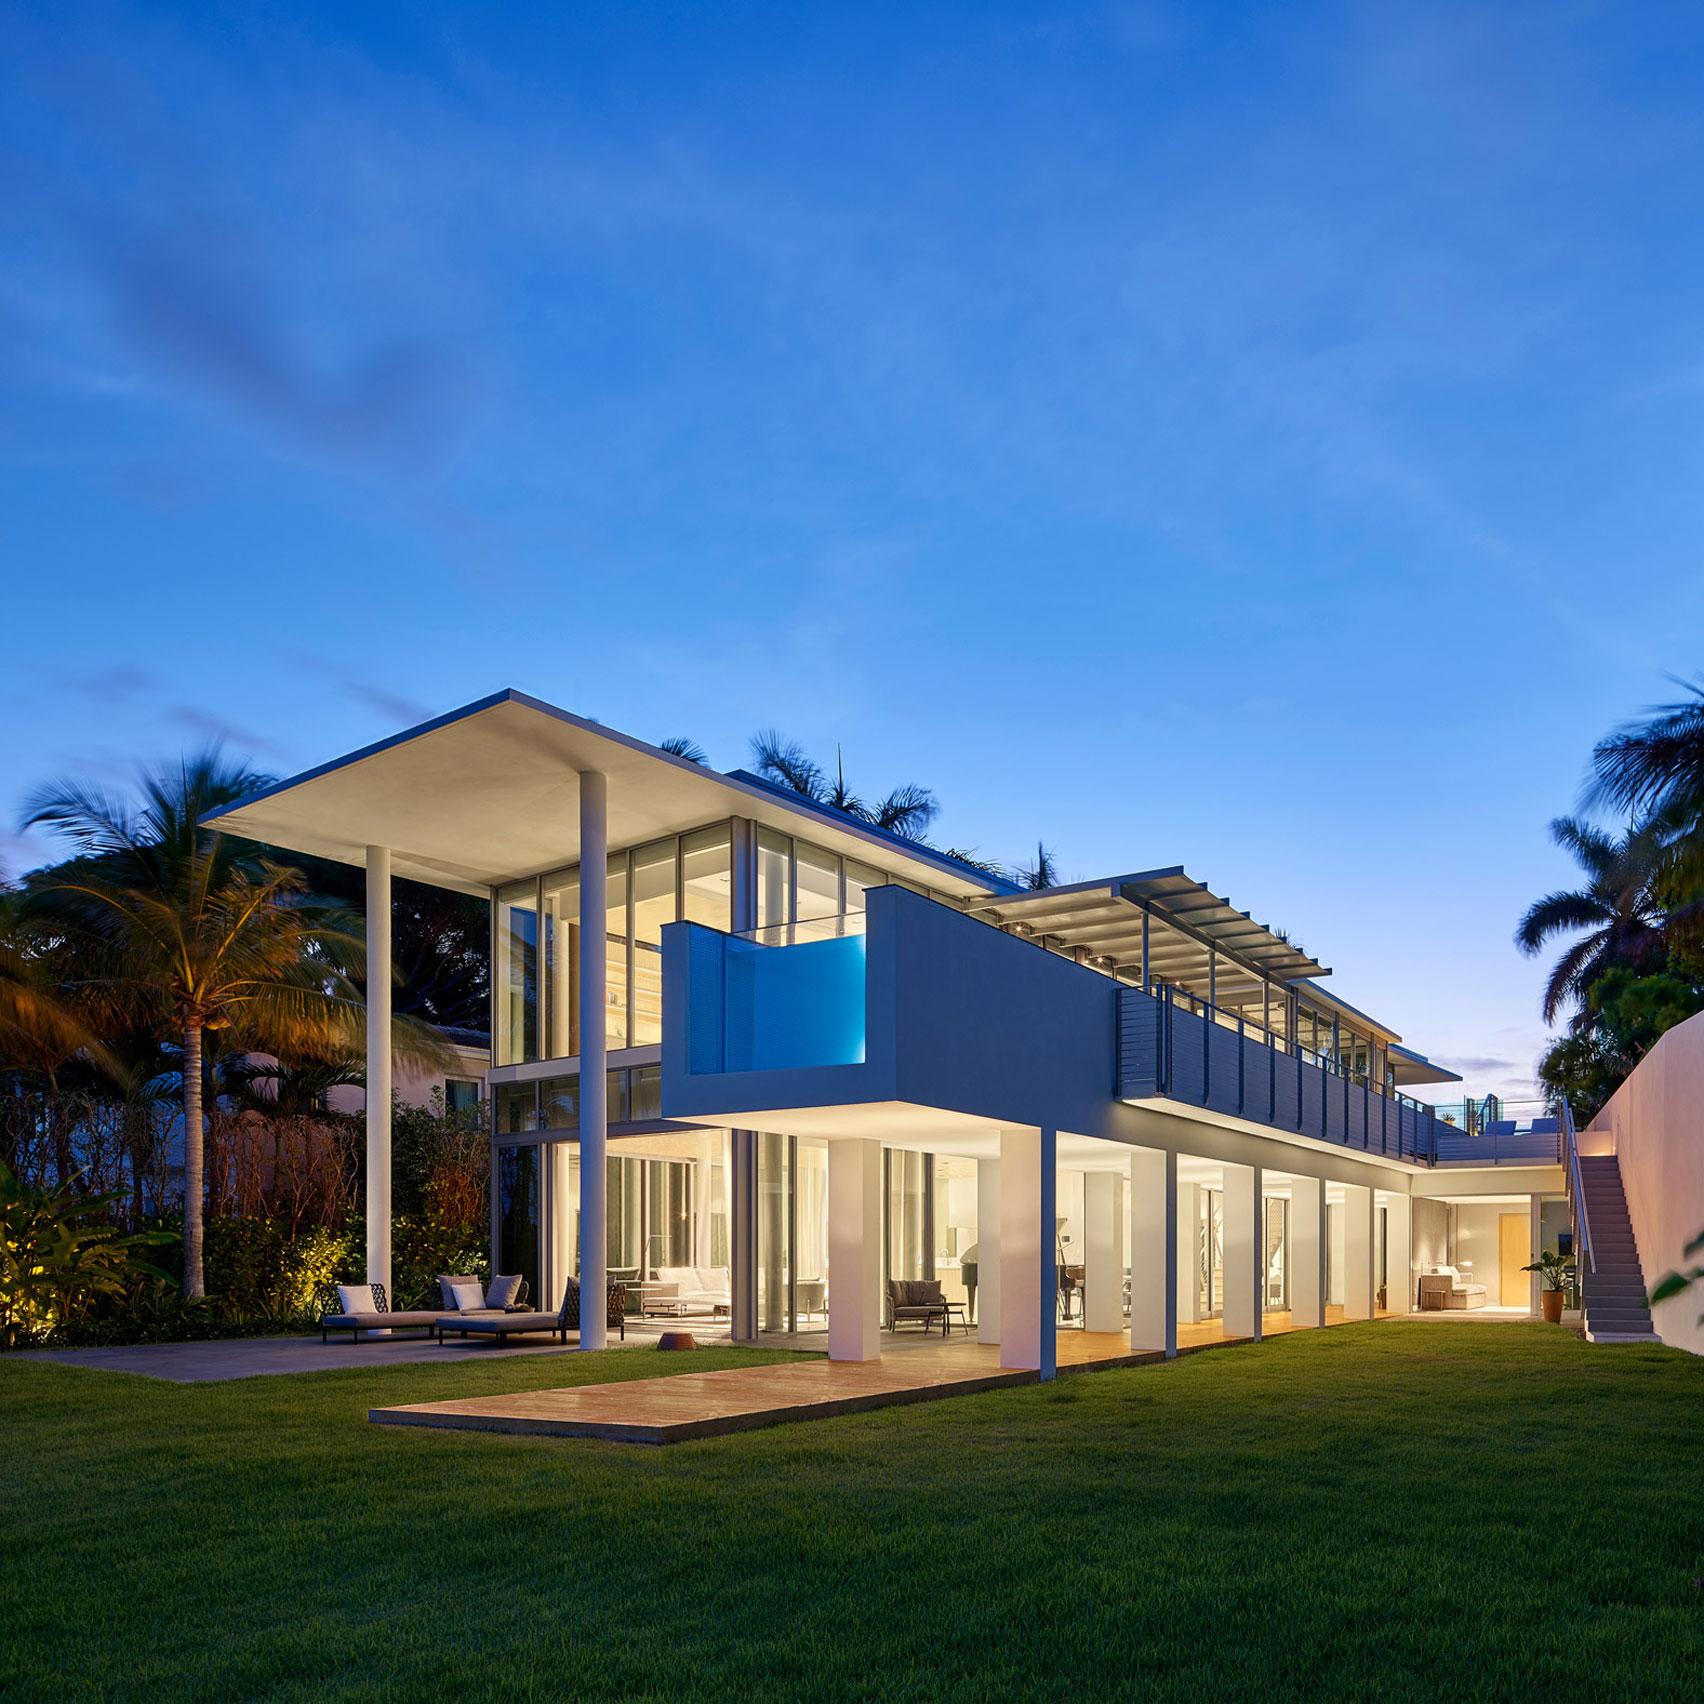 Observar Minero Editor  Bohlin Cywinski Jackson designs modernist white house in Miami Beach